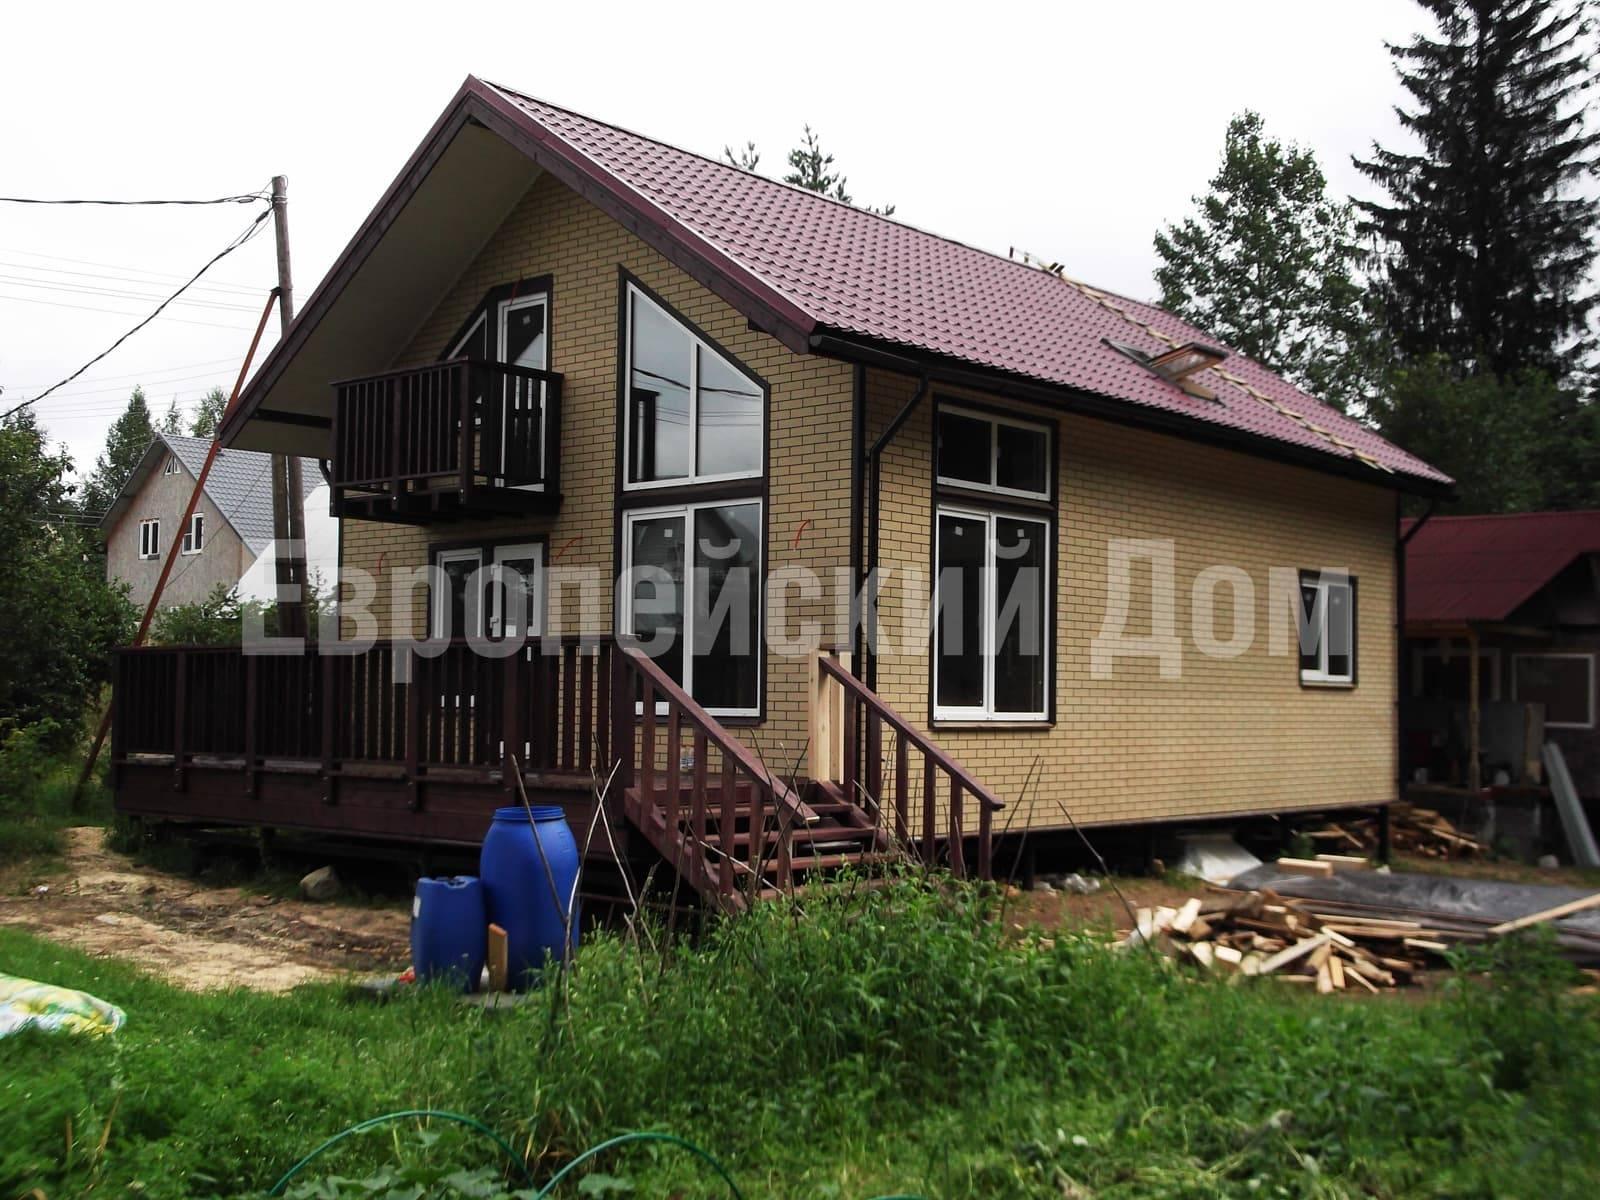 Облицовка каркасного дома: варианты отделки фасада каркасного дома с примерами